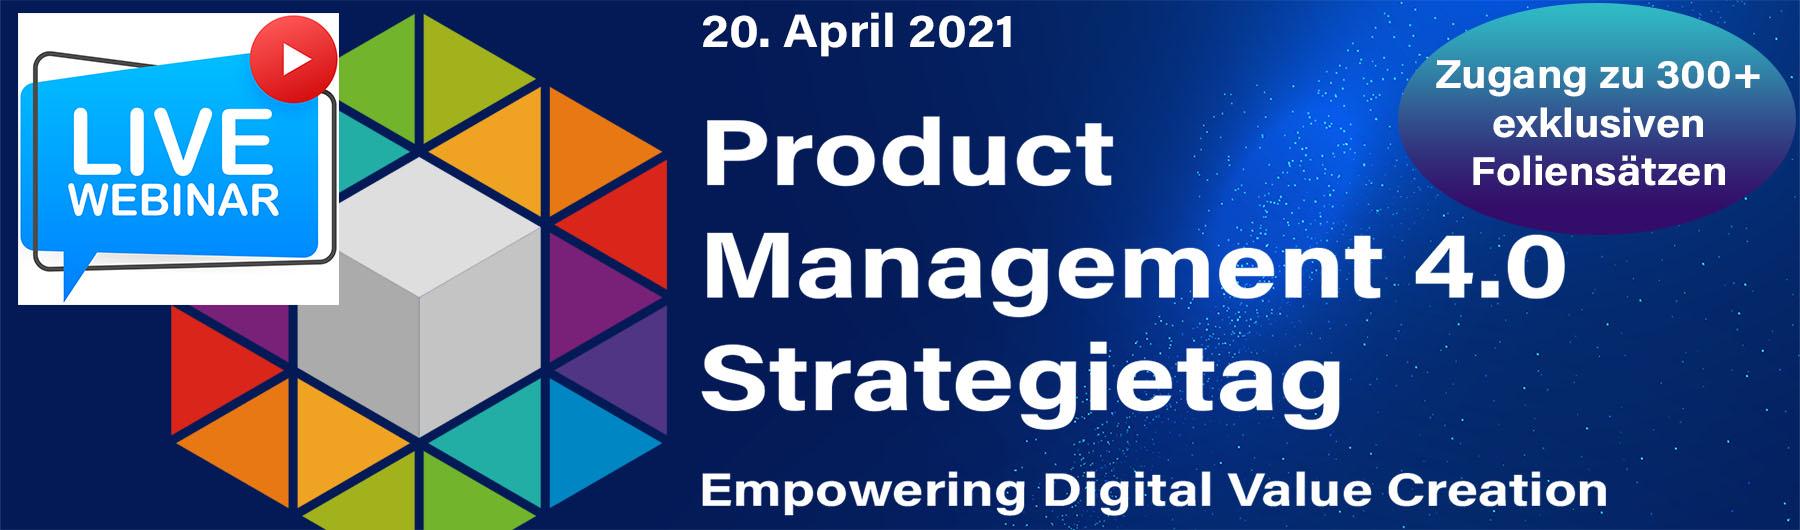 Product Management 4.0 Strategietag 2021